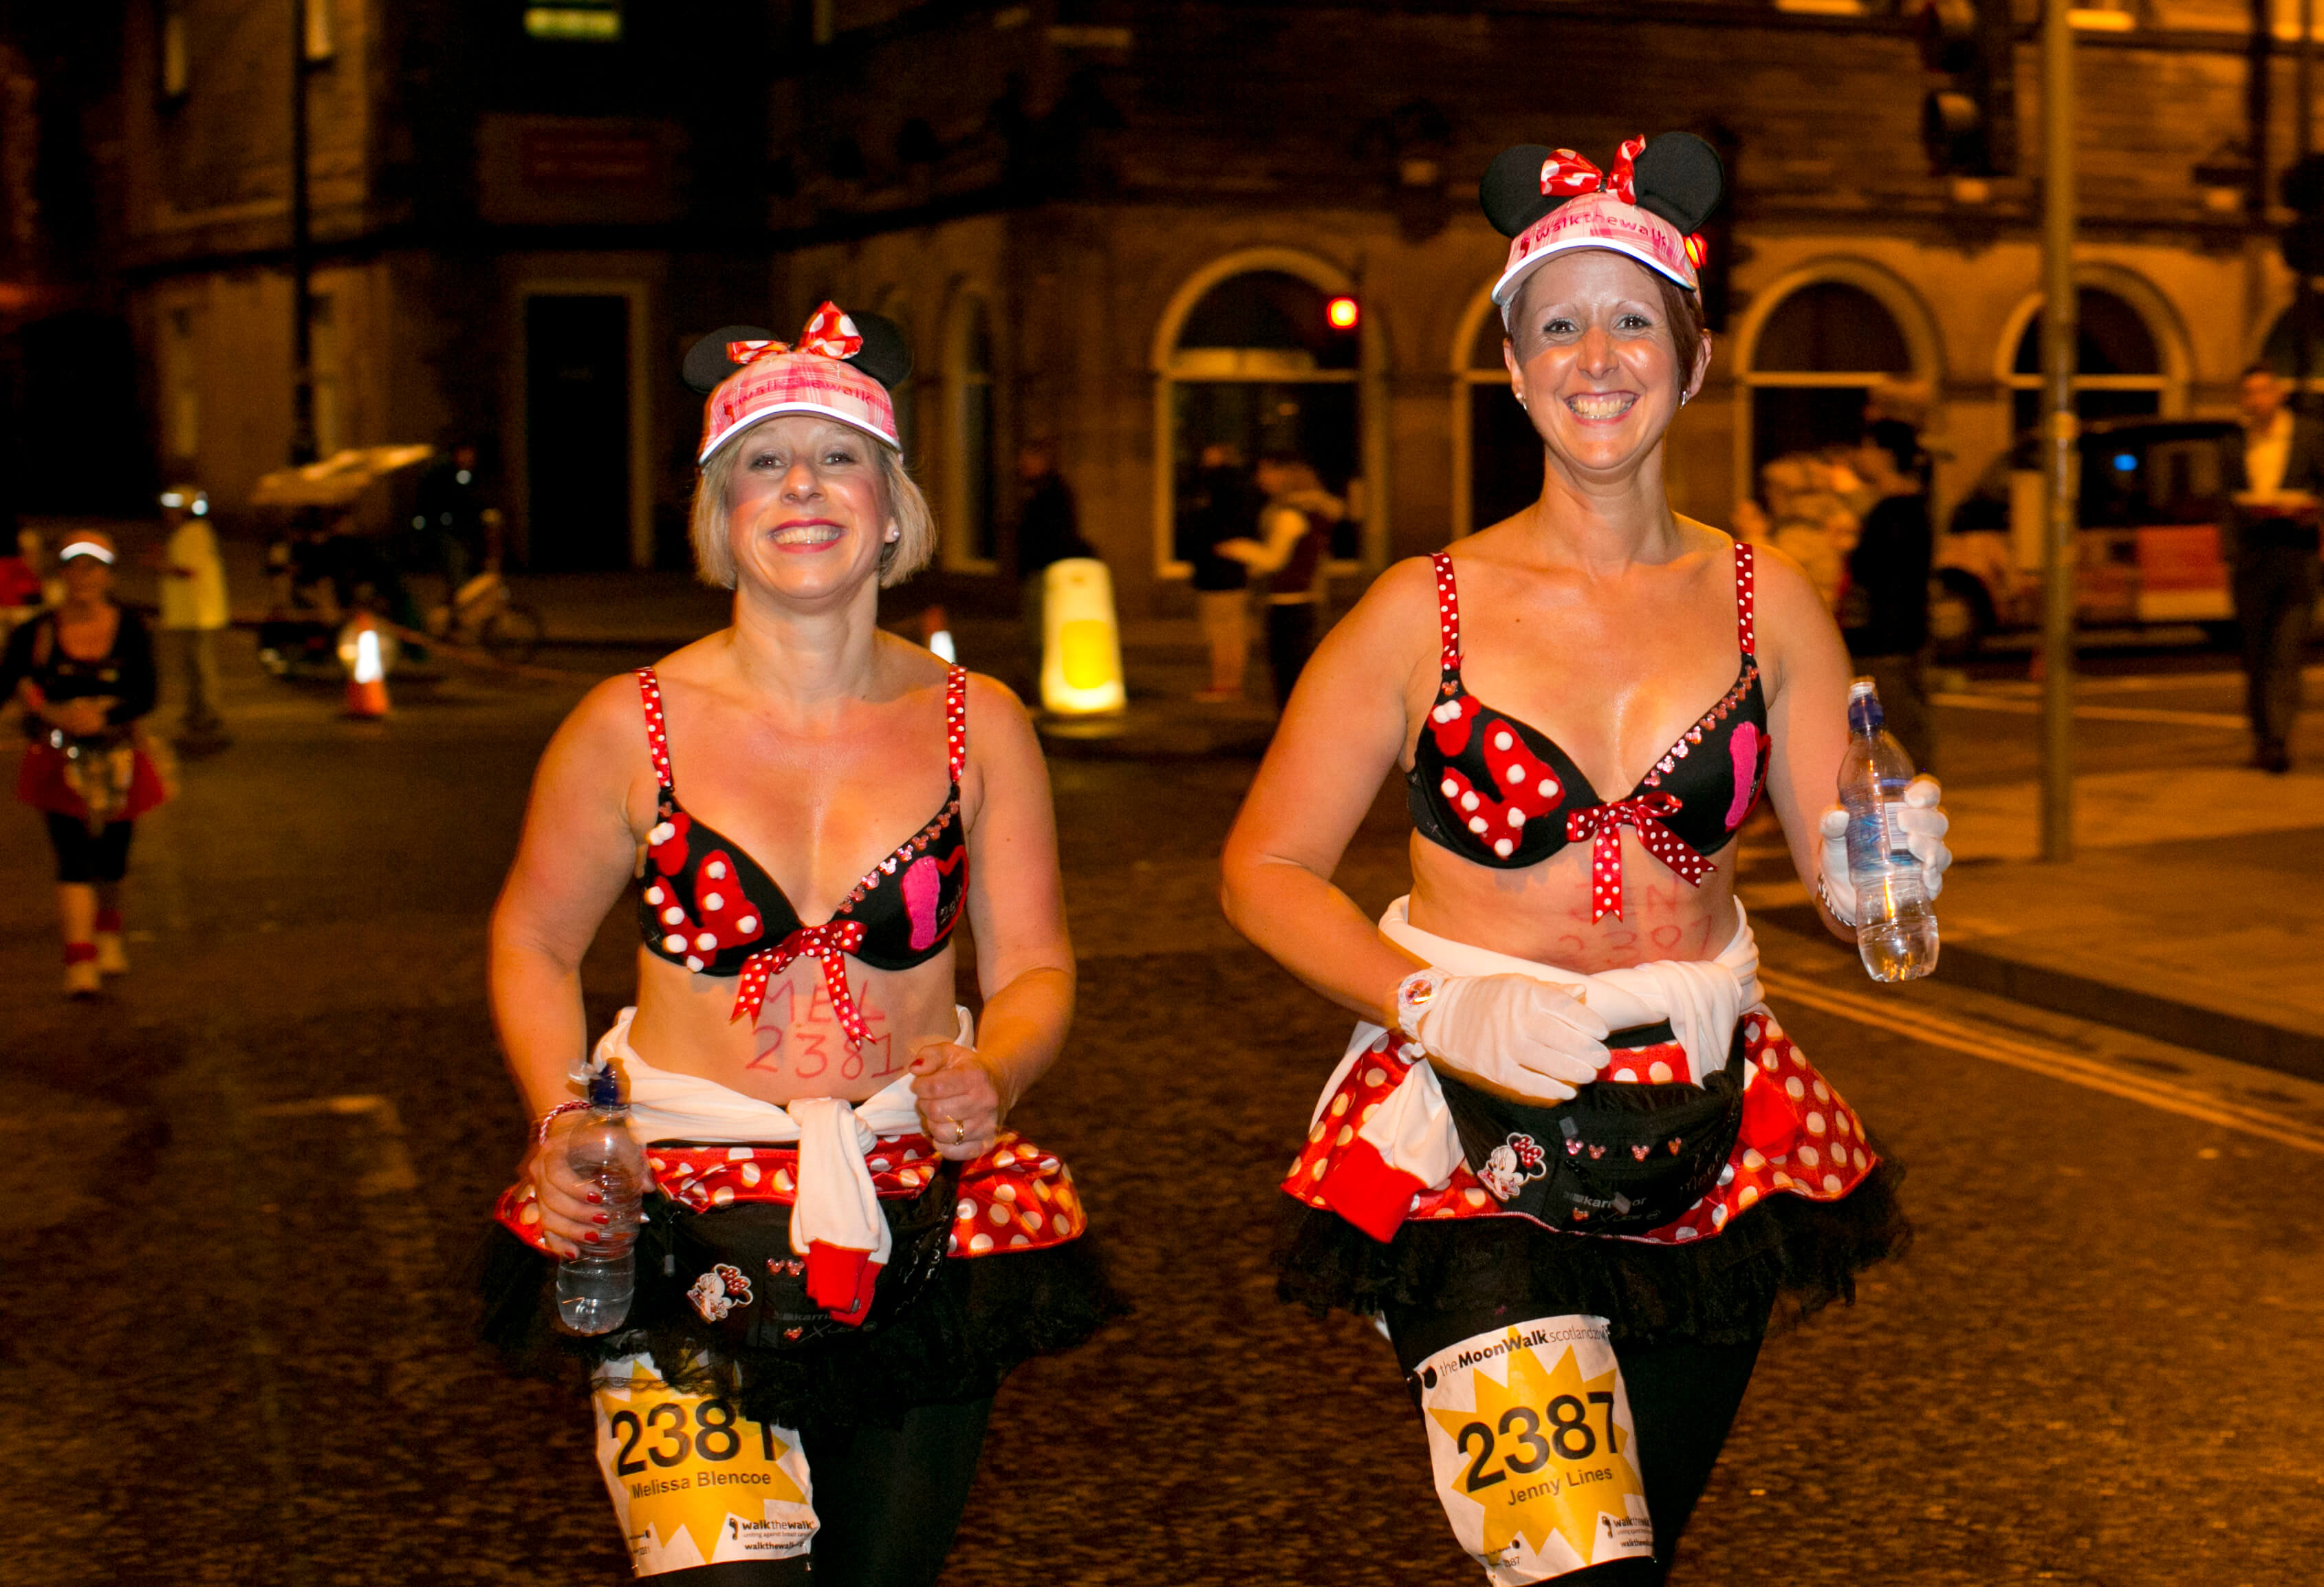 Walk The Walk The Moonwalk Scotland 2019 Join Now